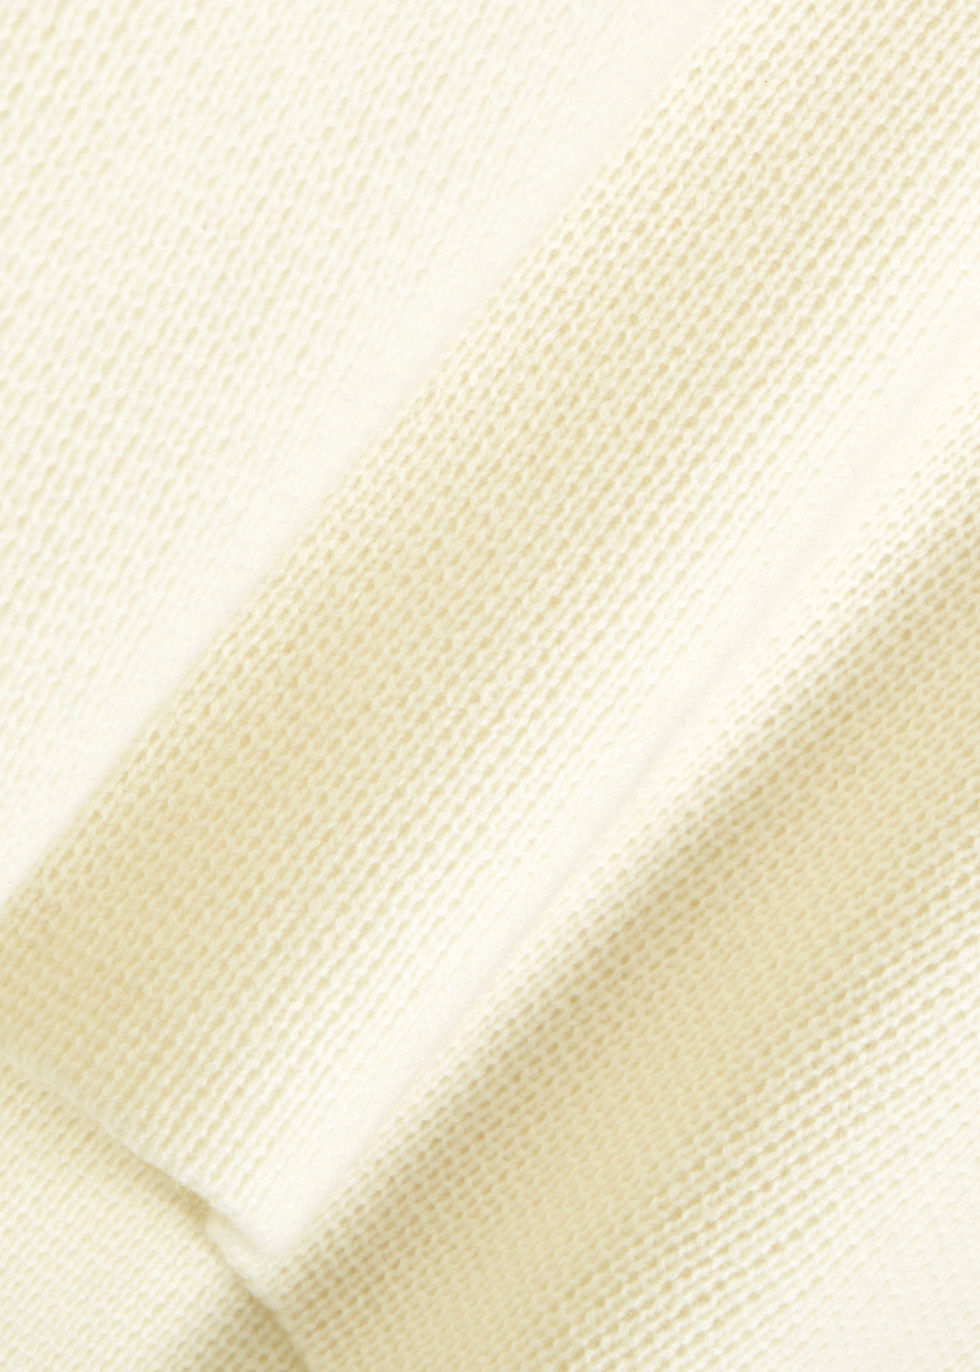 Moscow cream cashmere jumper - Le Kasha